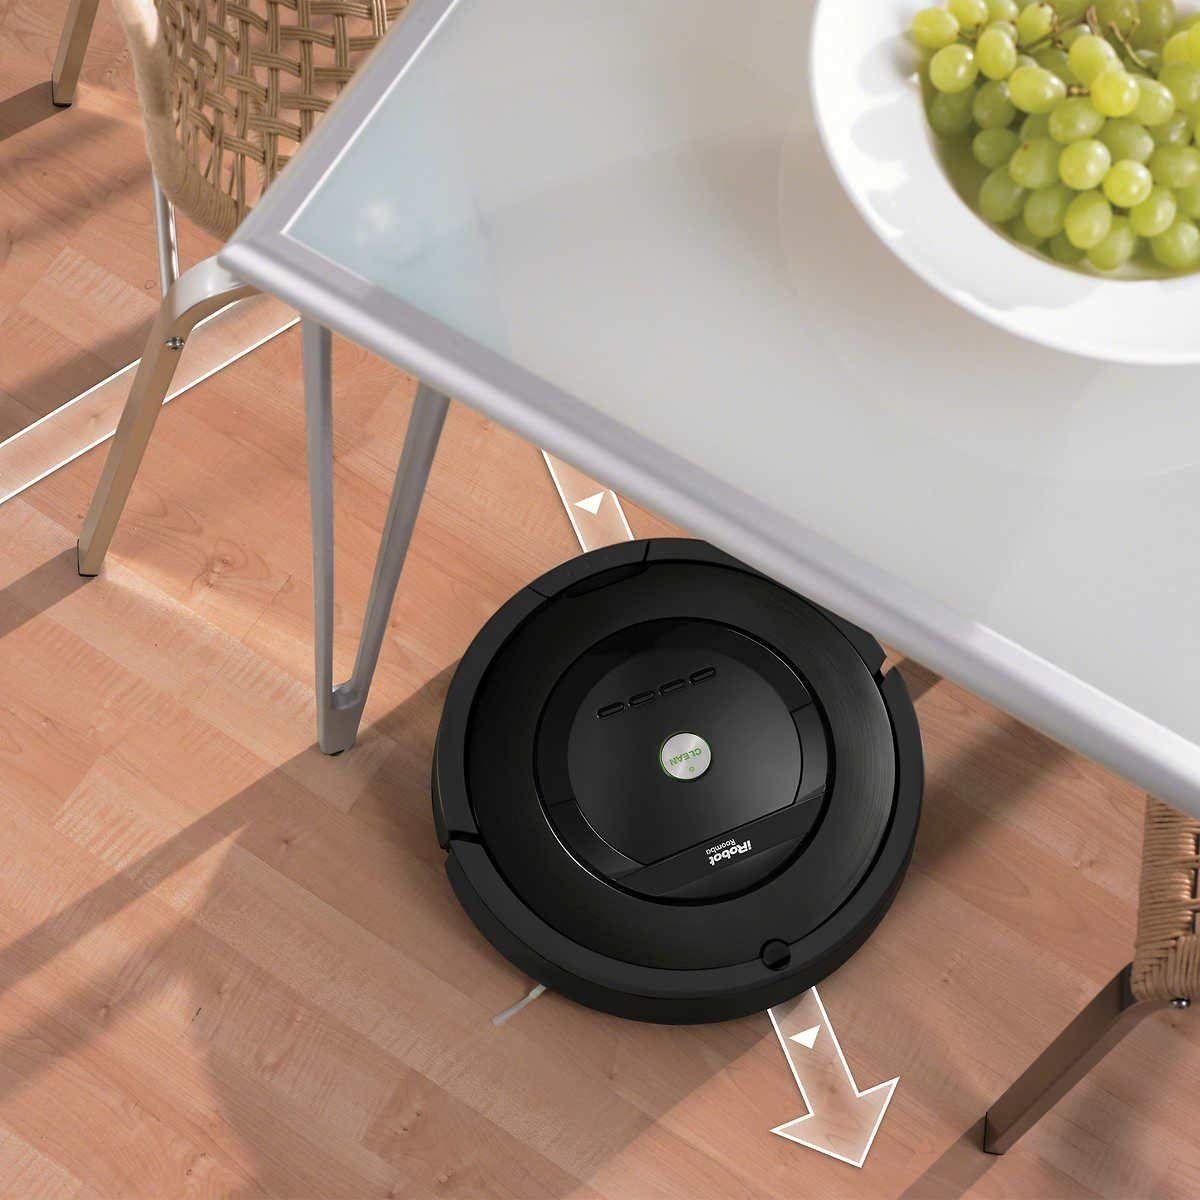 best roomba for pet hair Irobot roomba, Robot vacuum